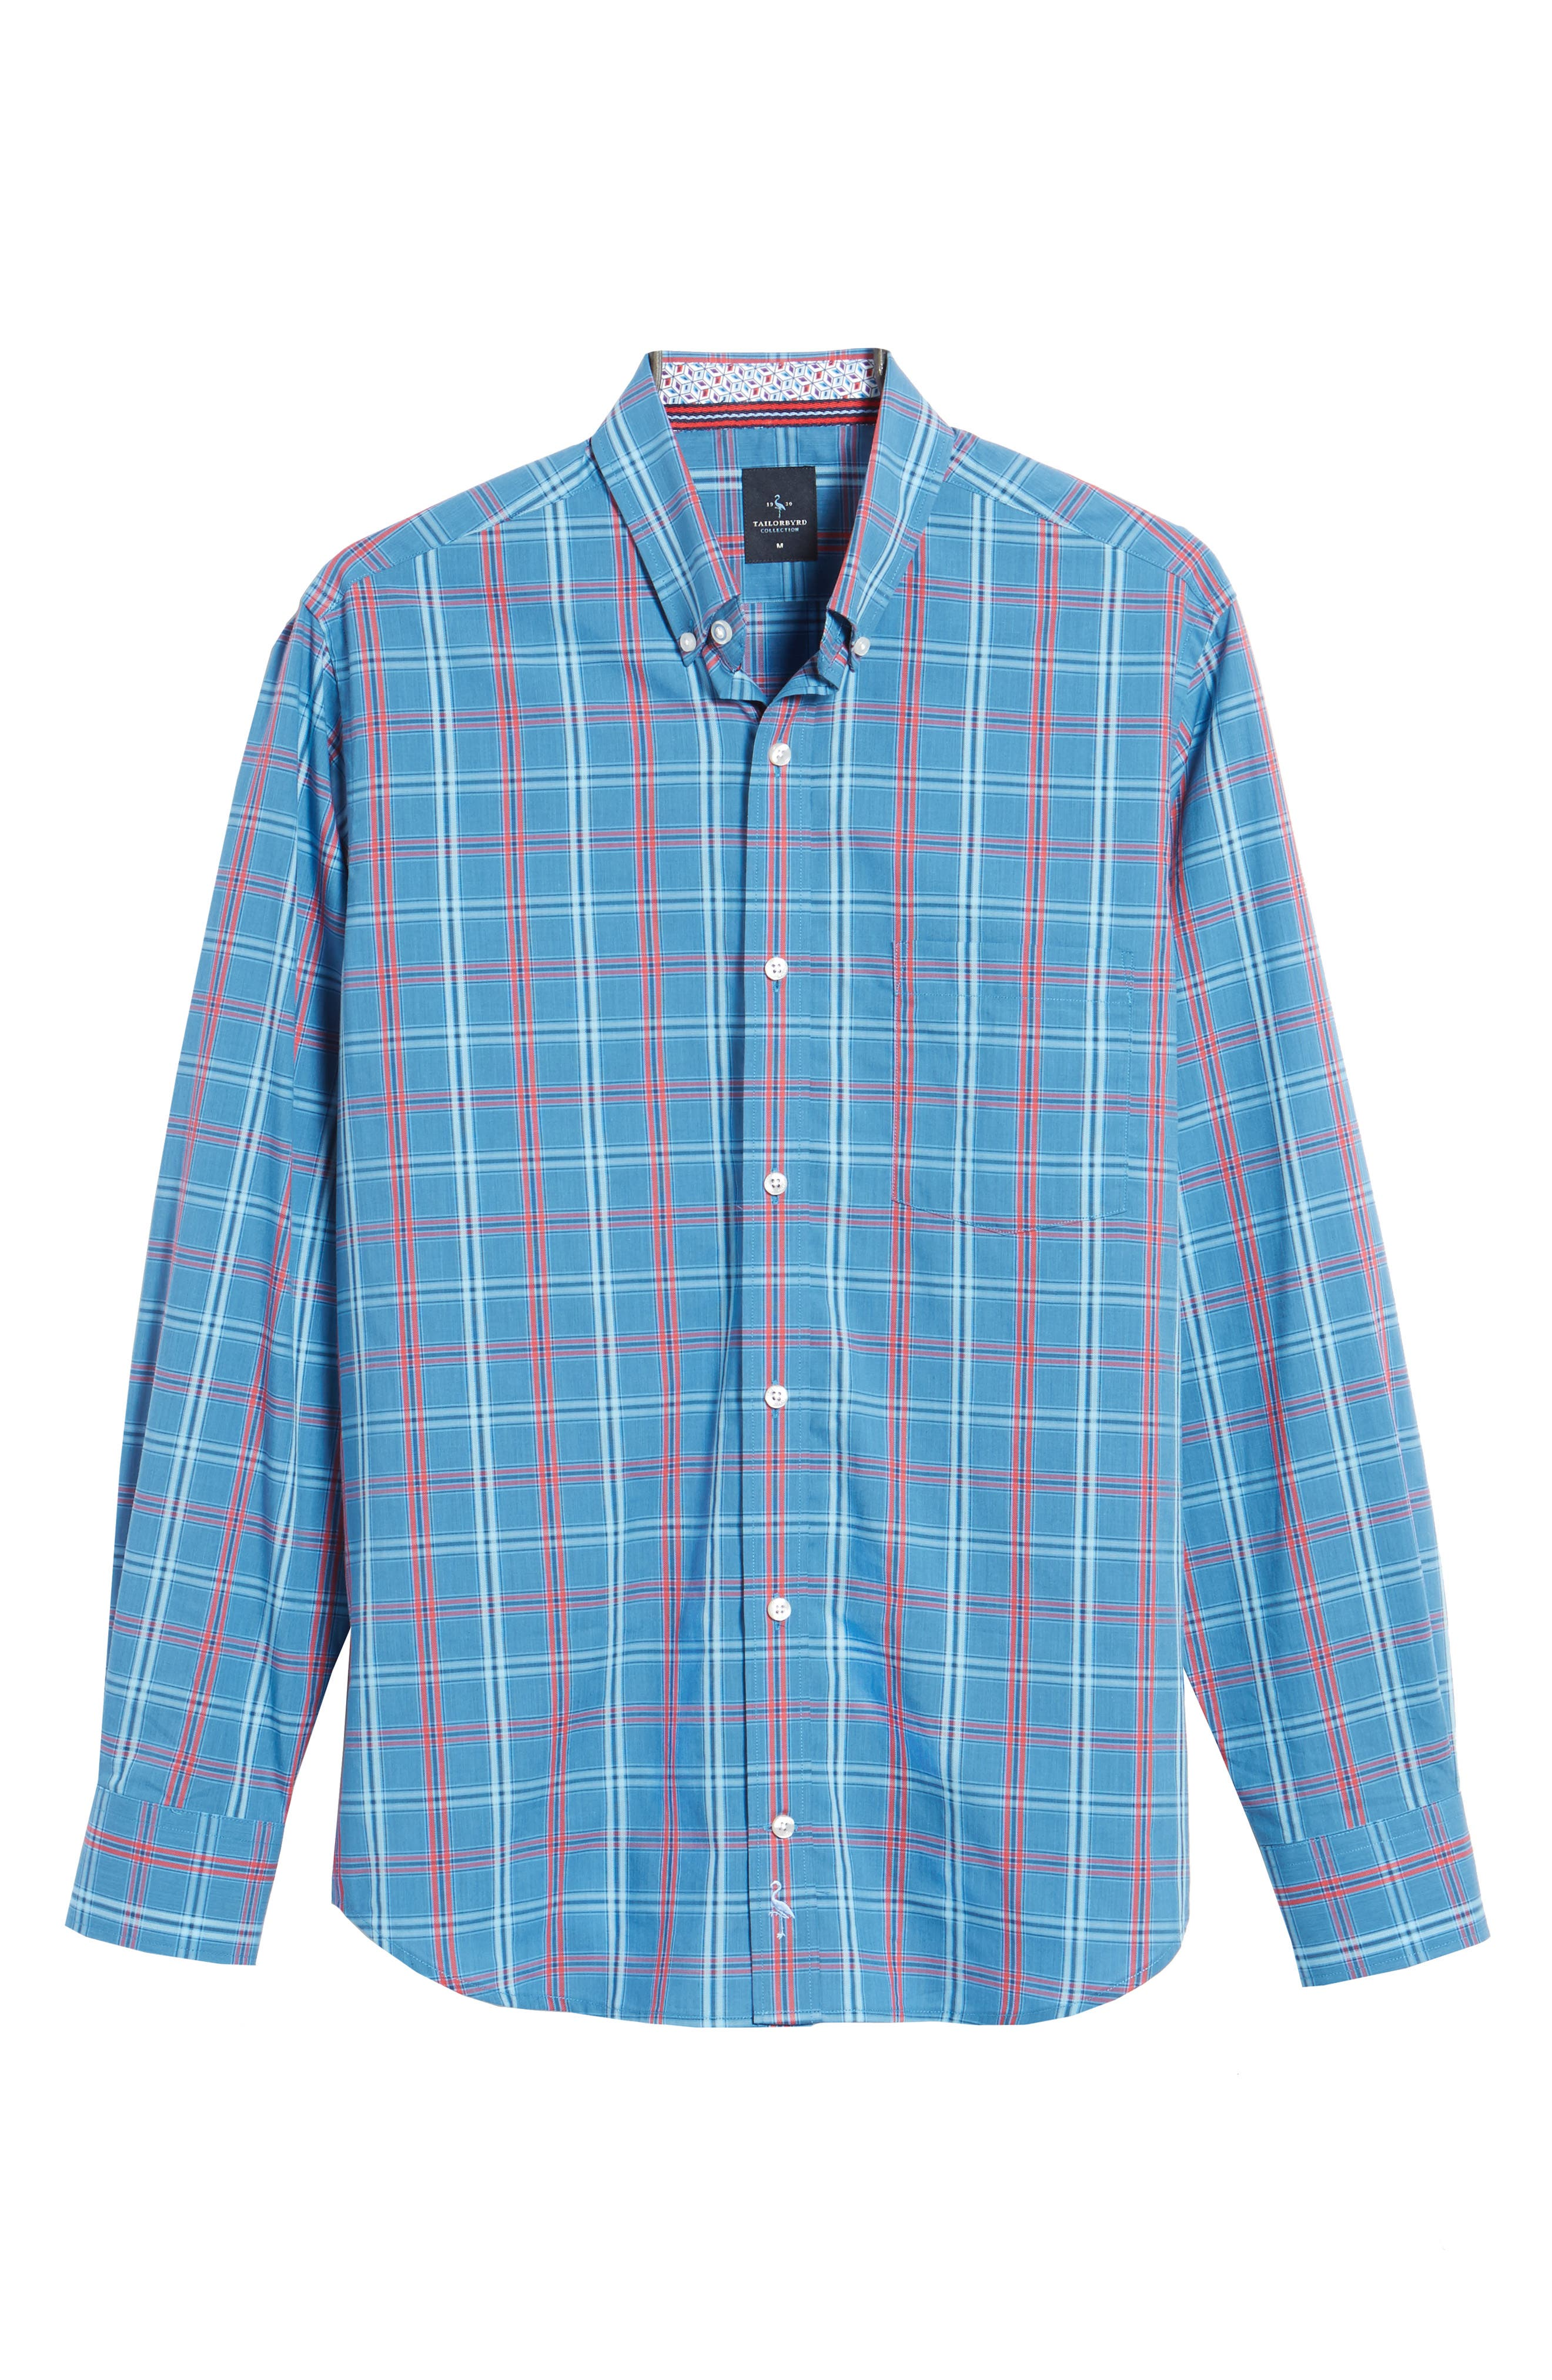 Ashland Windowpane Check Sport Shirt,                             Alternate thumbnail 6, color,                             Blue